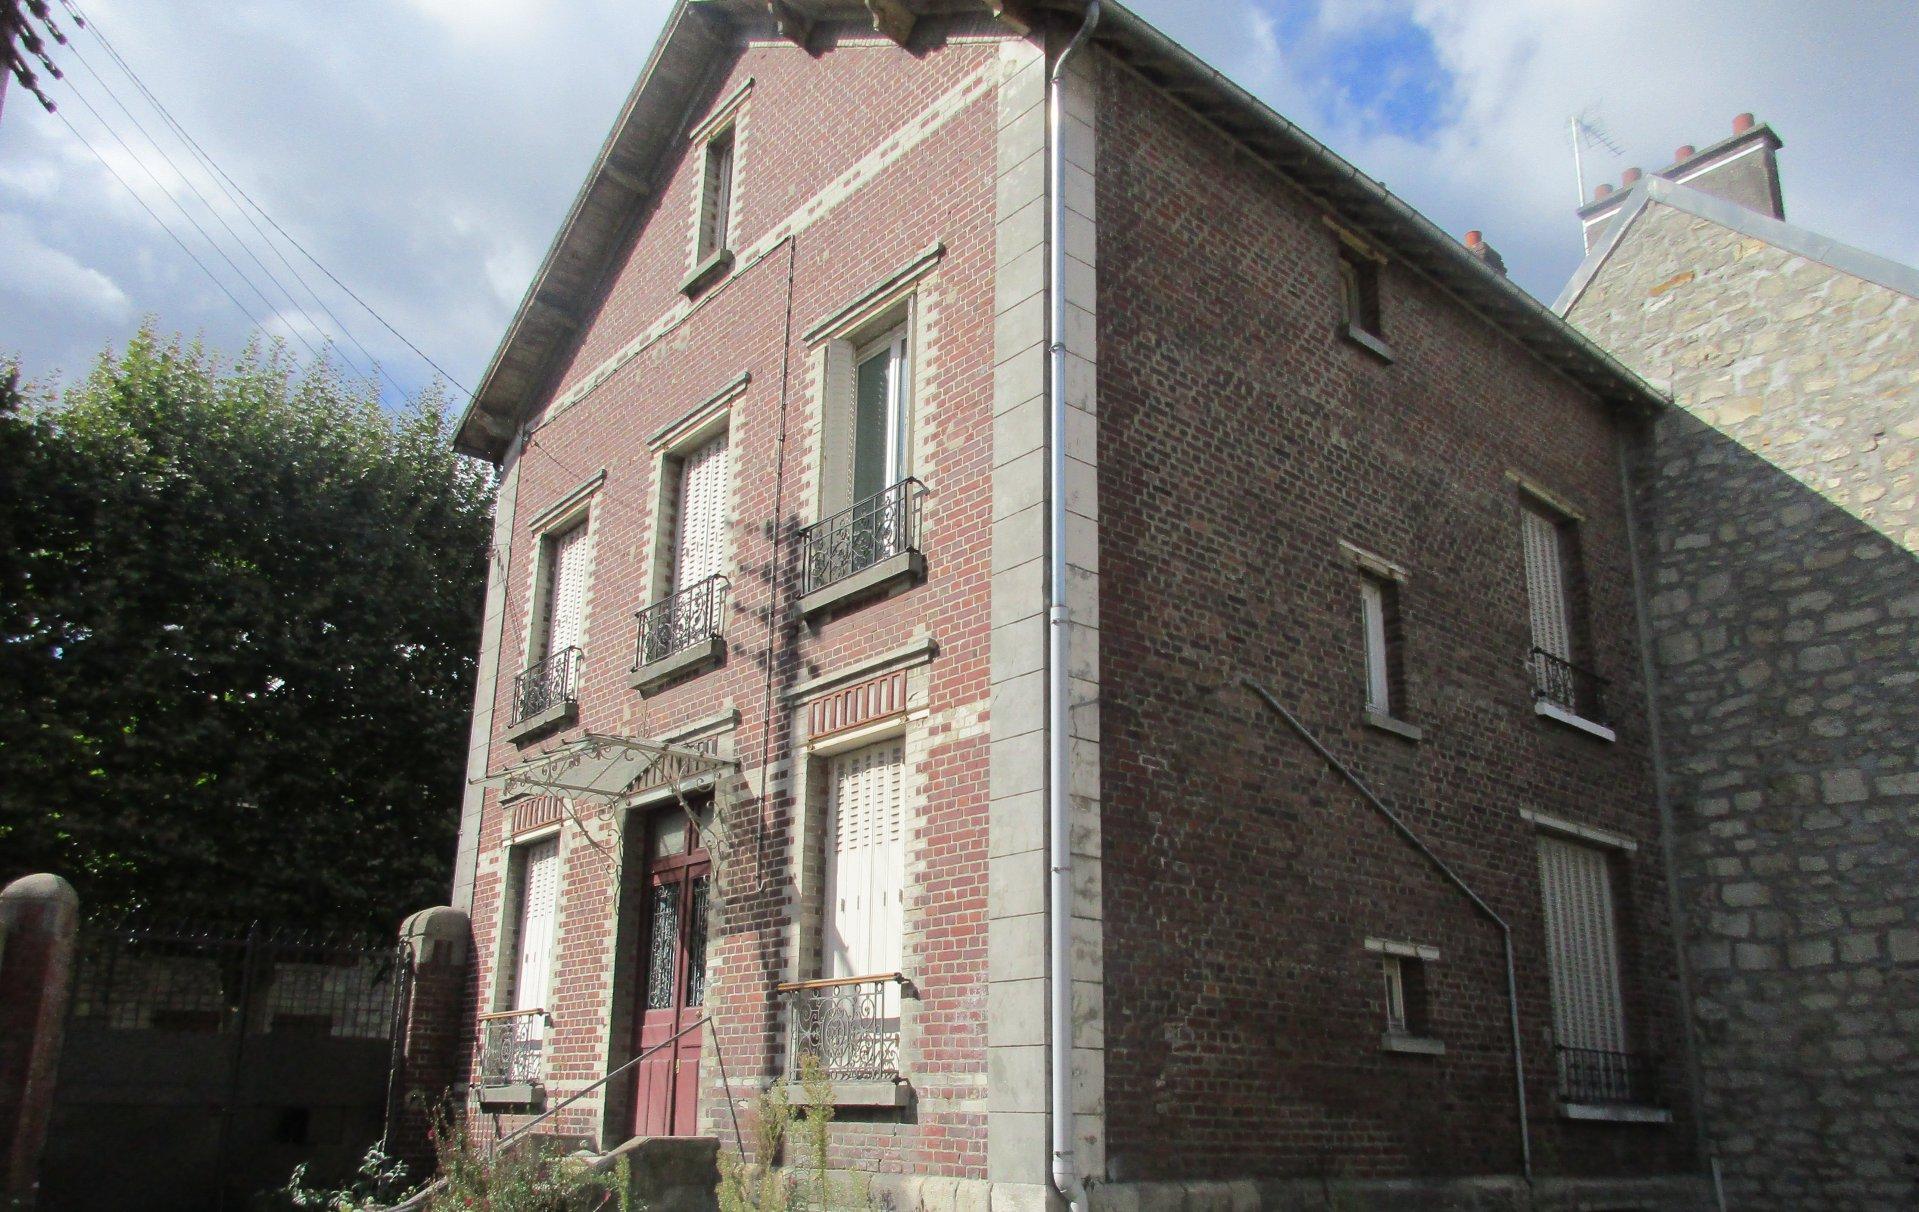 Maison - Creil - 260 000 € FAI